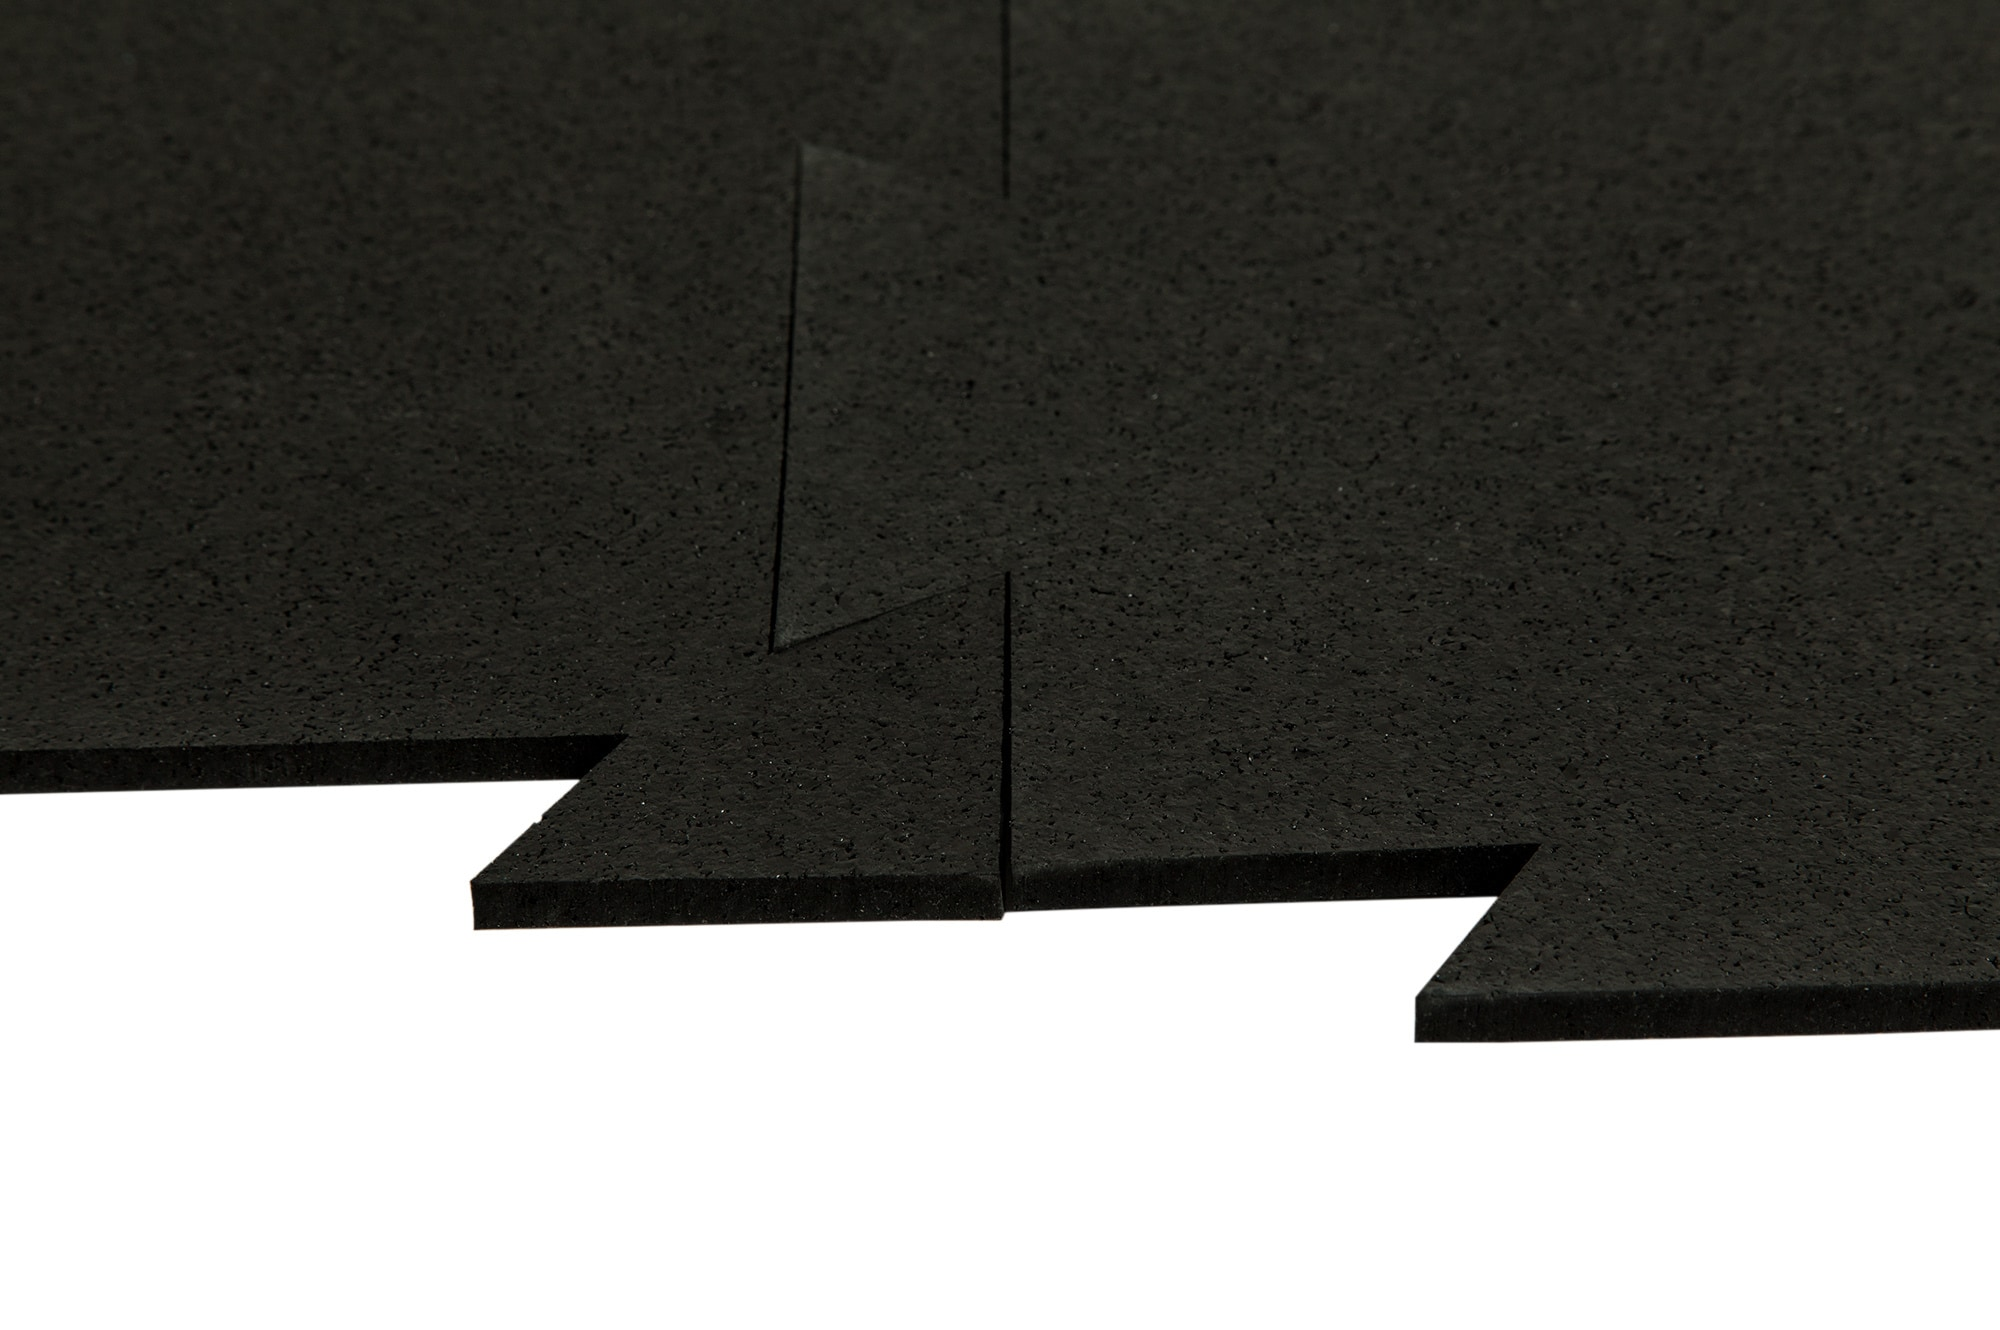 Free samples brava rubber floor tiles interlocking endurance free samples brava rubber floor tiles interlocking endurance collection basalt black 3x3x14 dailygadgetfo Choice Image